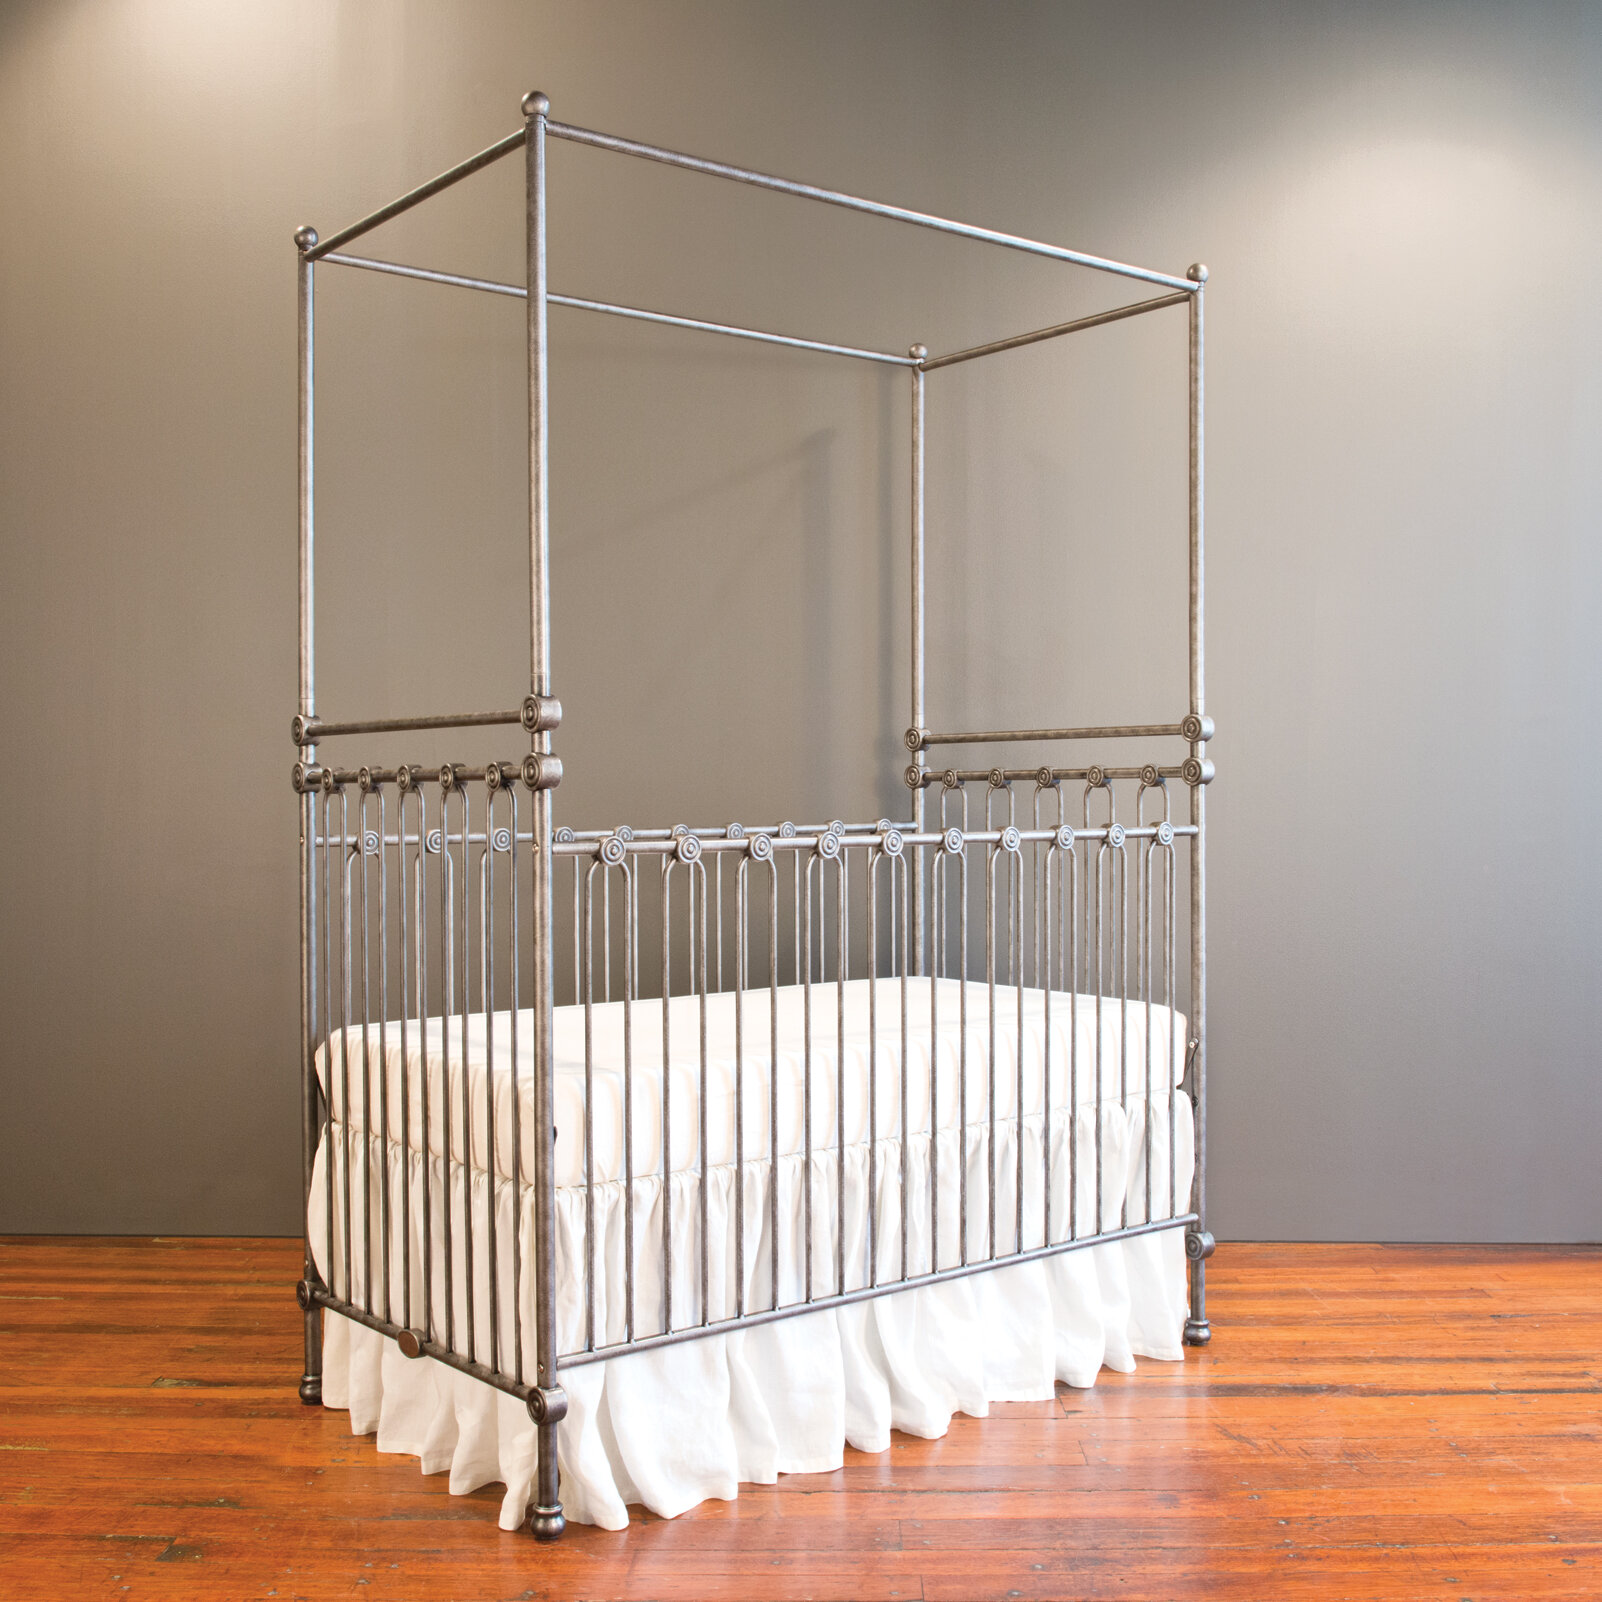 Bratt Decor Joy Canopy 3-in-1 Convertible Crib | Wayfair